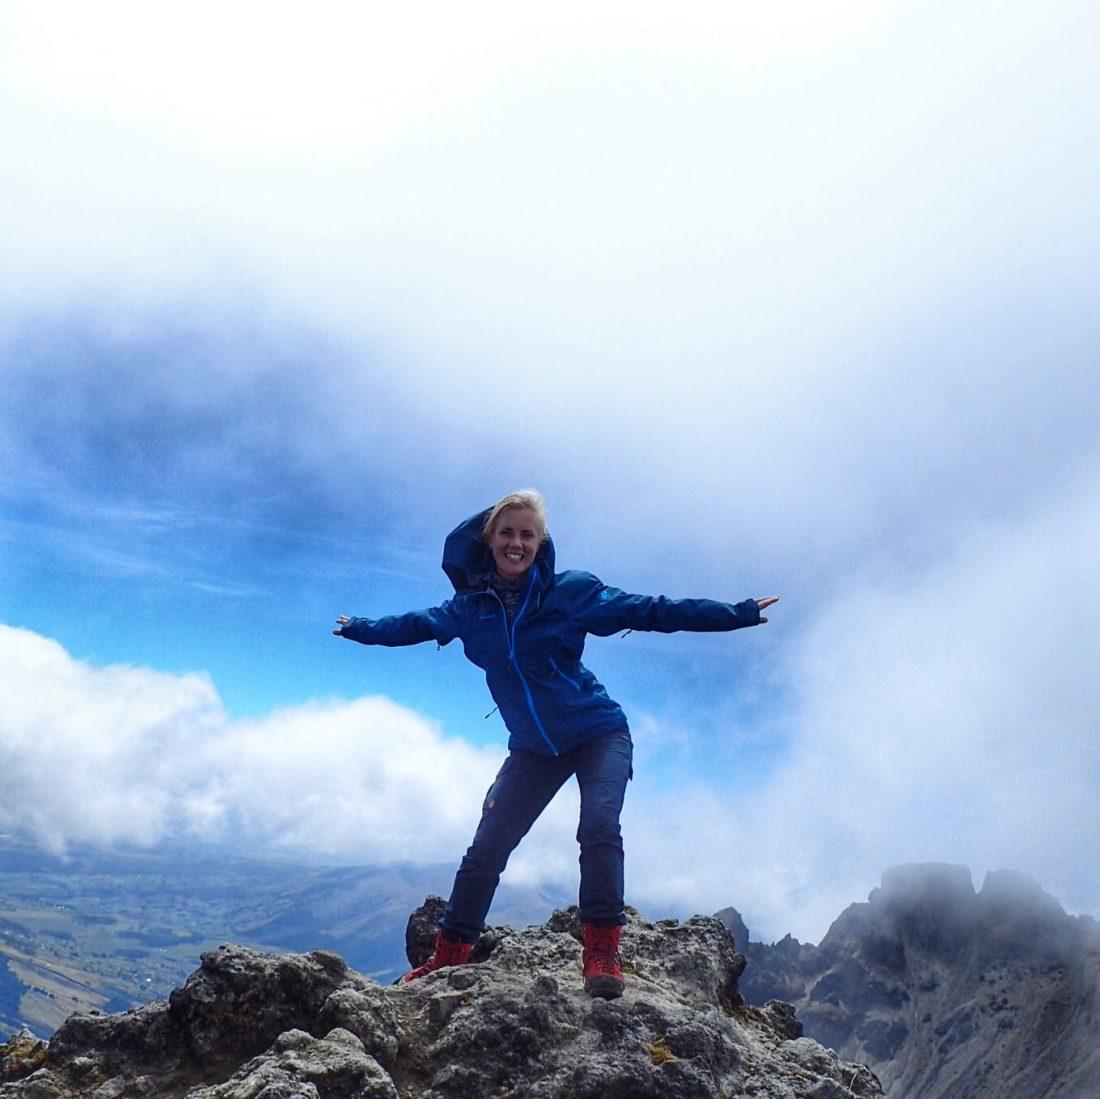 Vrijheid blijheid - imbabura - wanderlotje